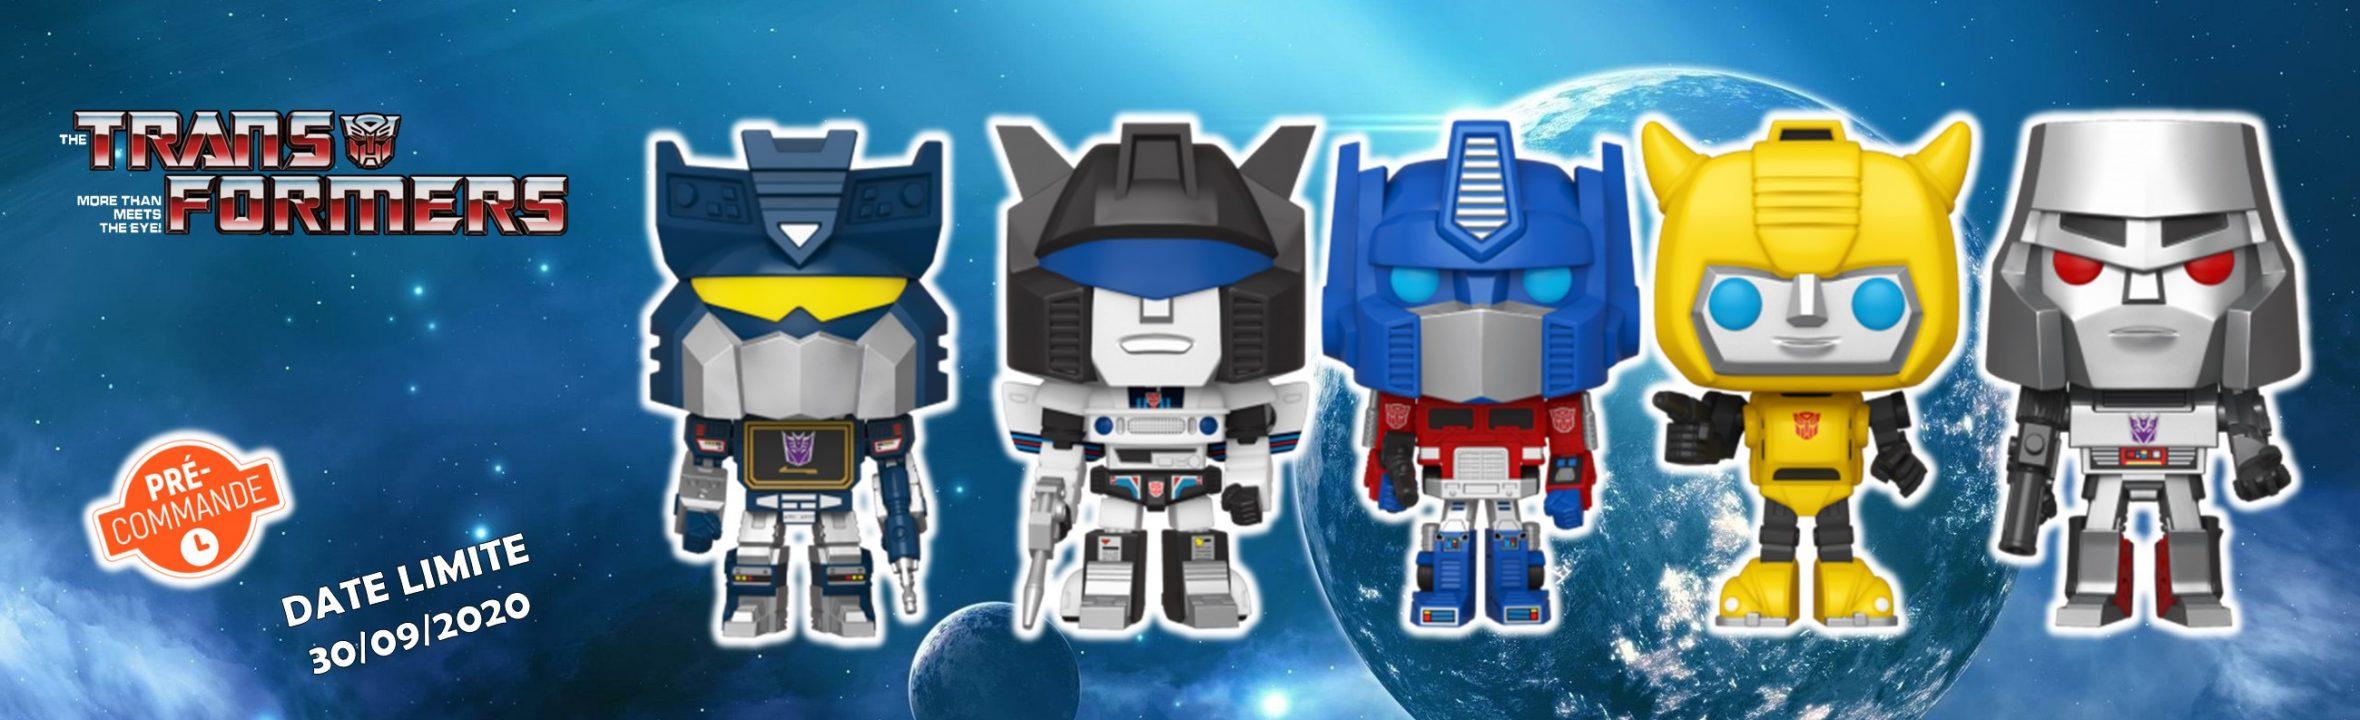 funko pop Transformers retro toys goodin shop